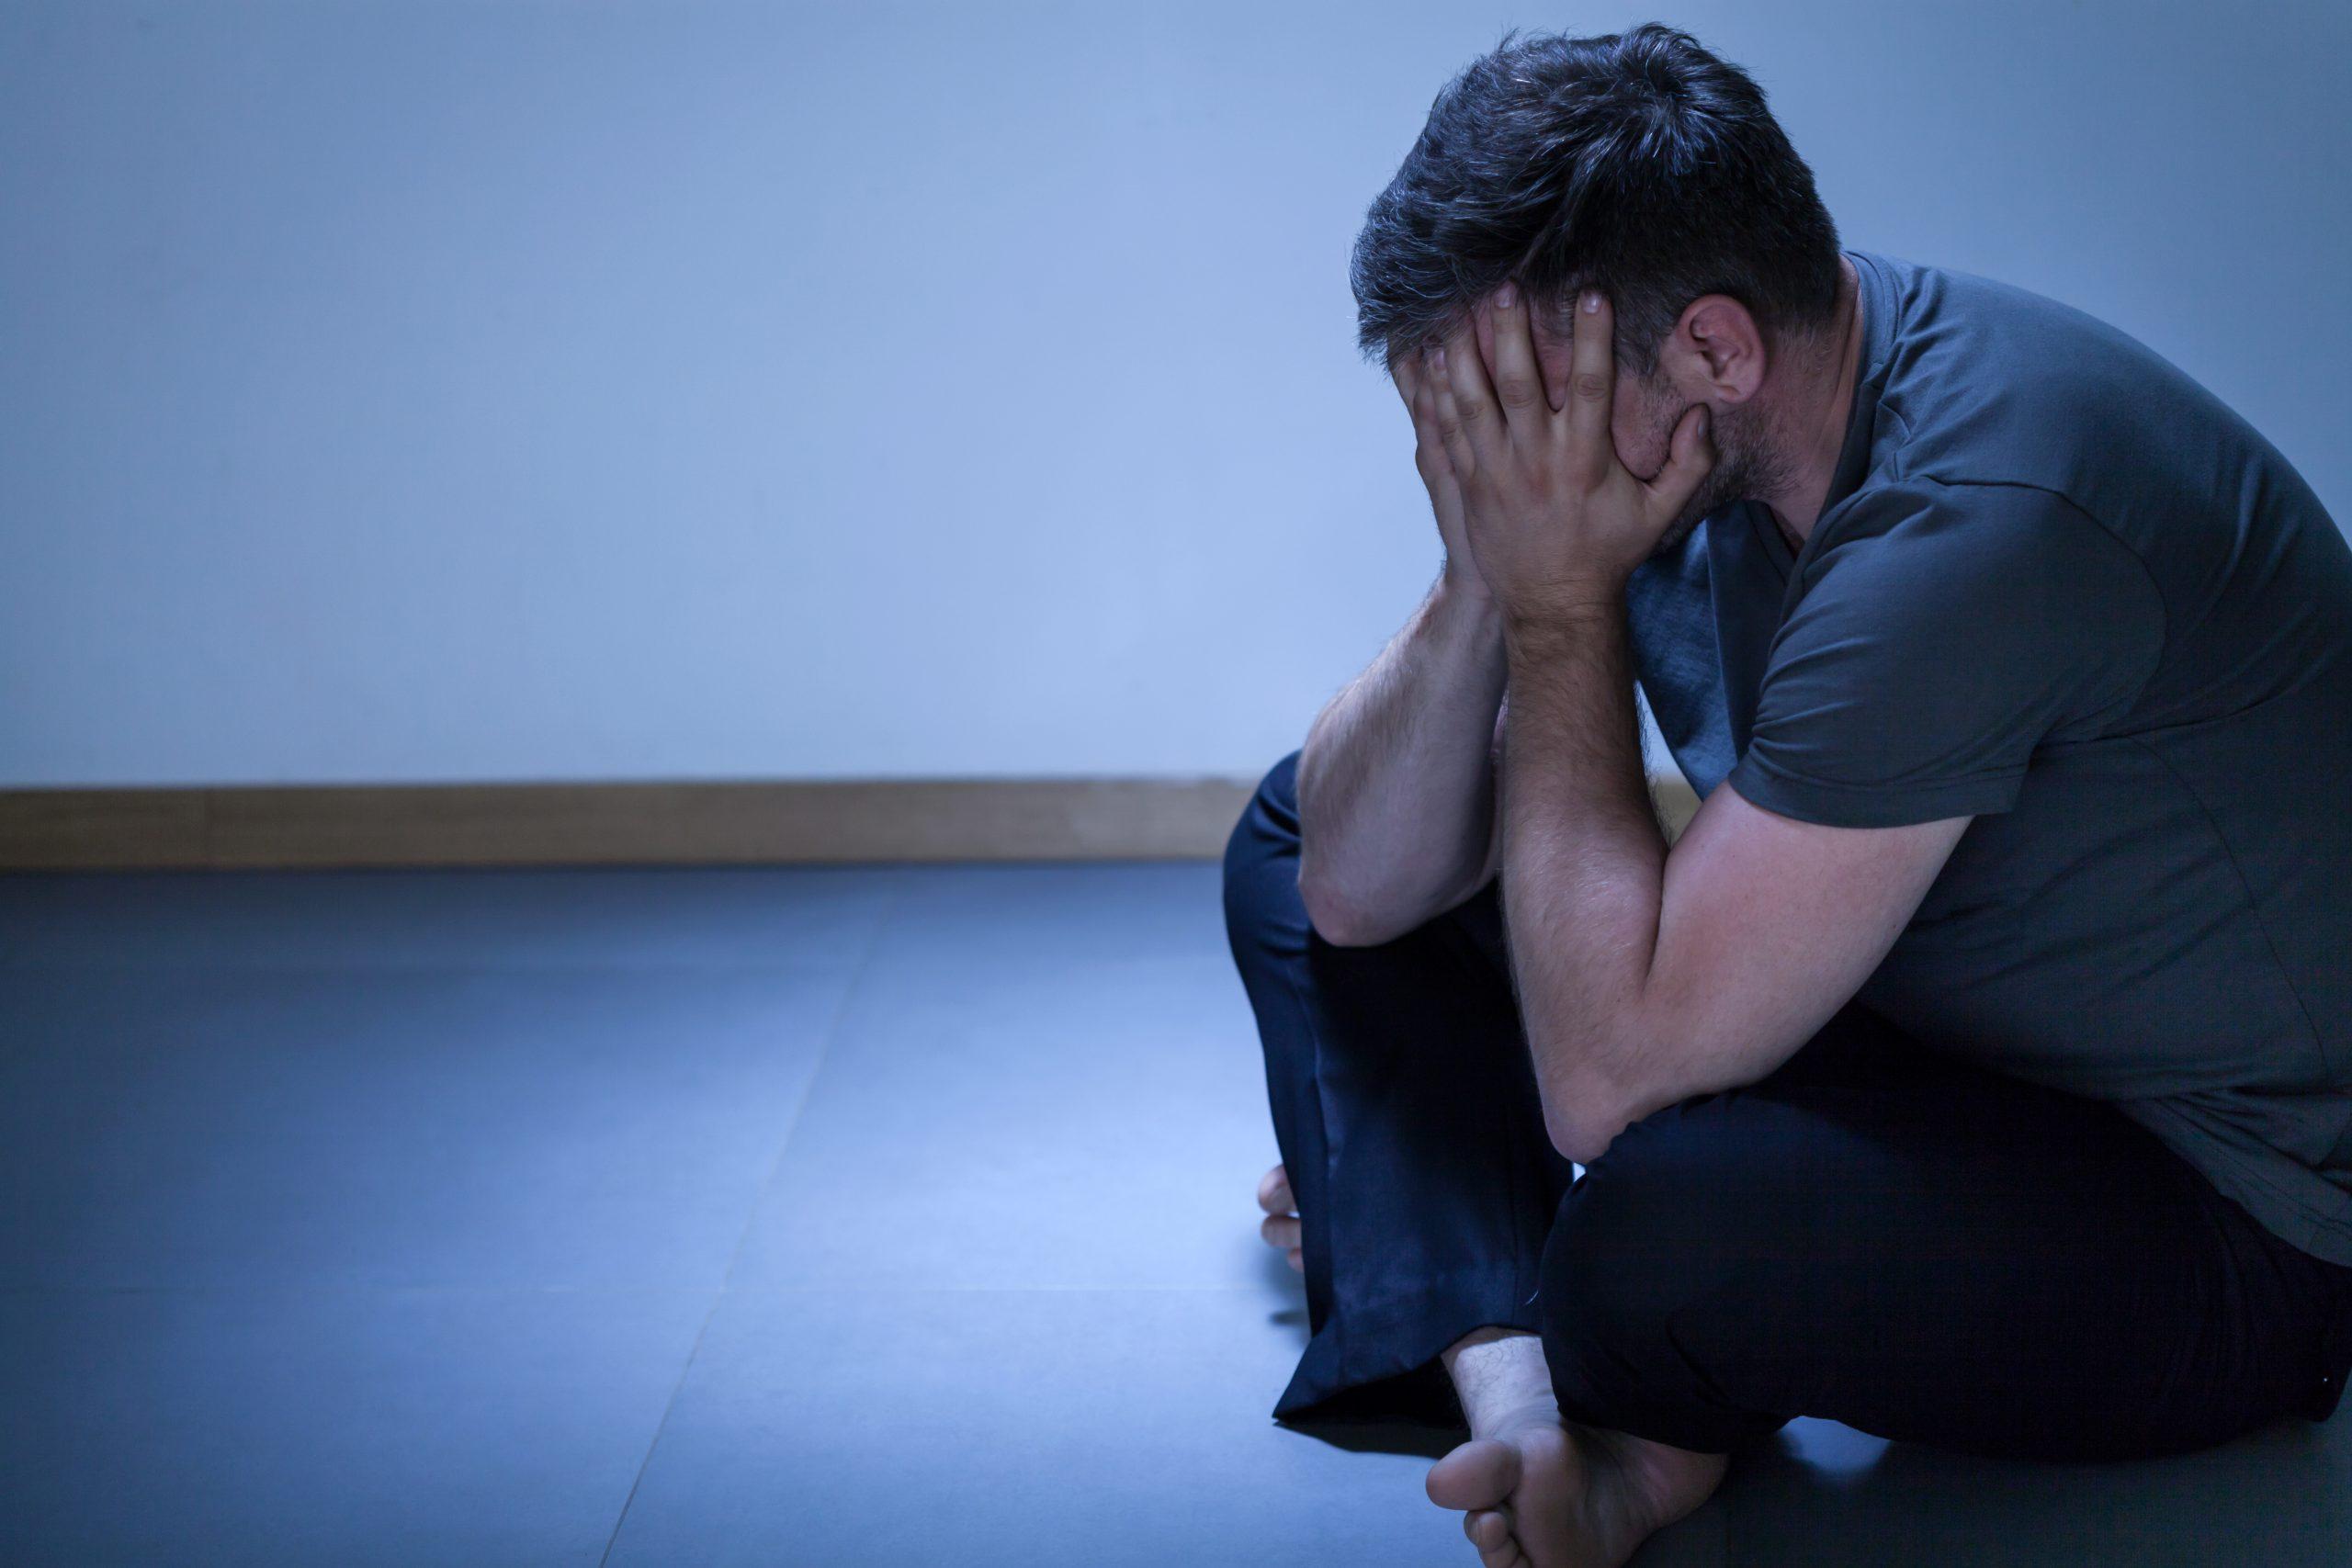 Muškarac, depresija